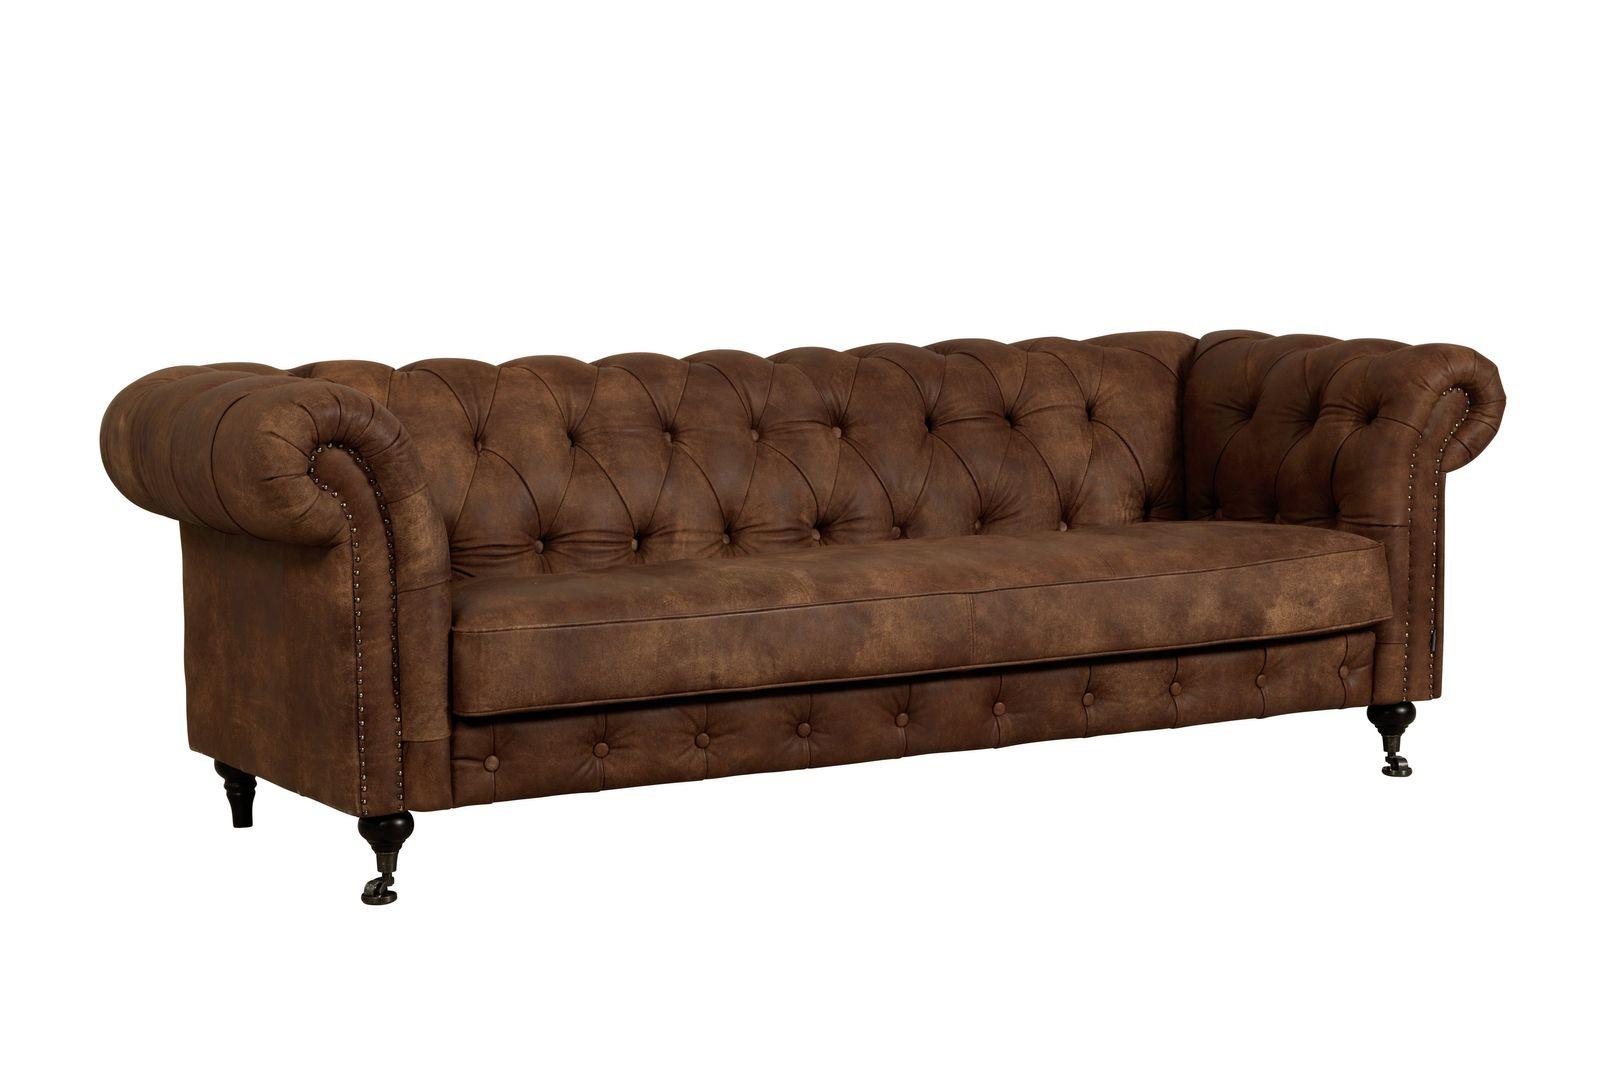 Furninova Chesterfield Sofa Churchill - Größe, Bezug und Farbe wählen